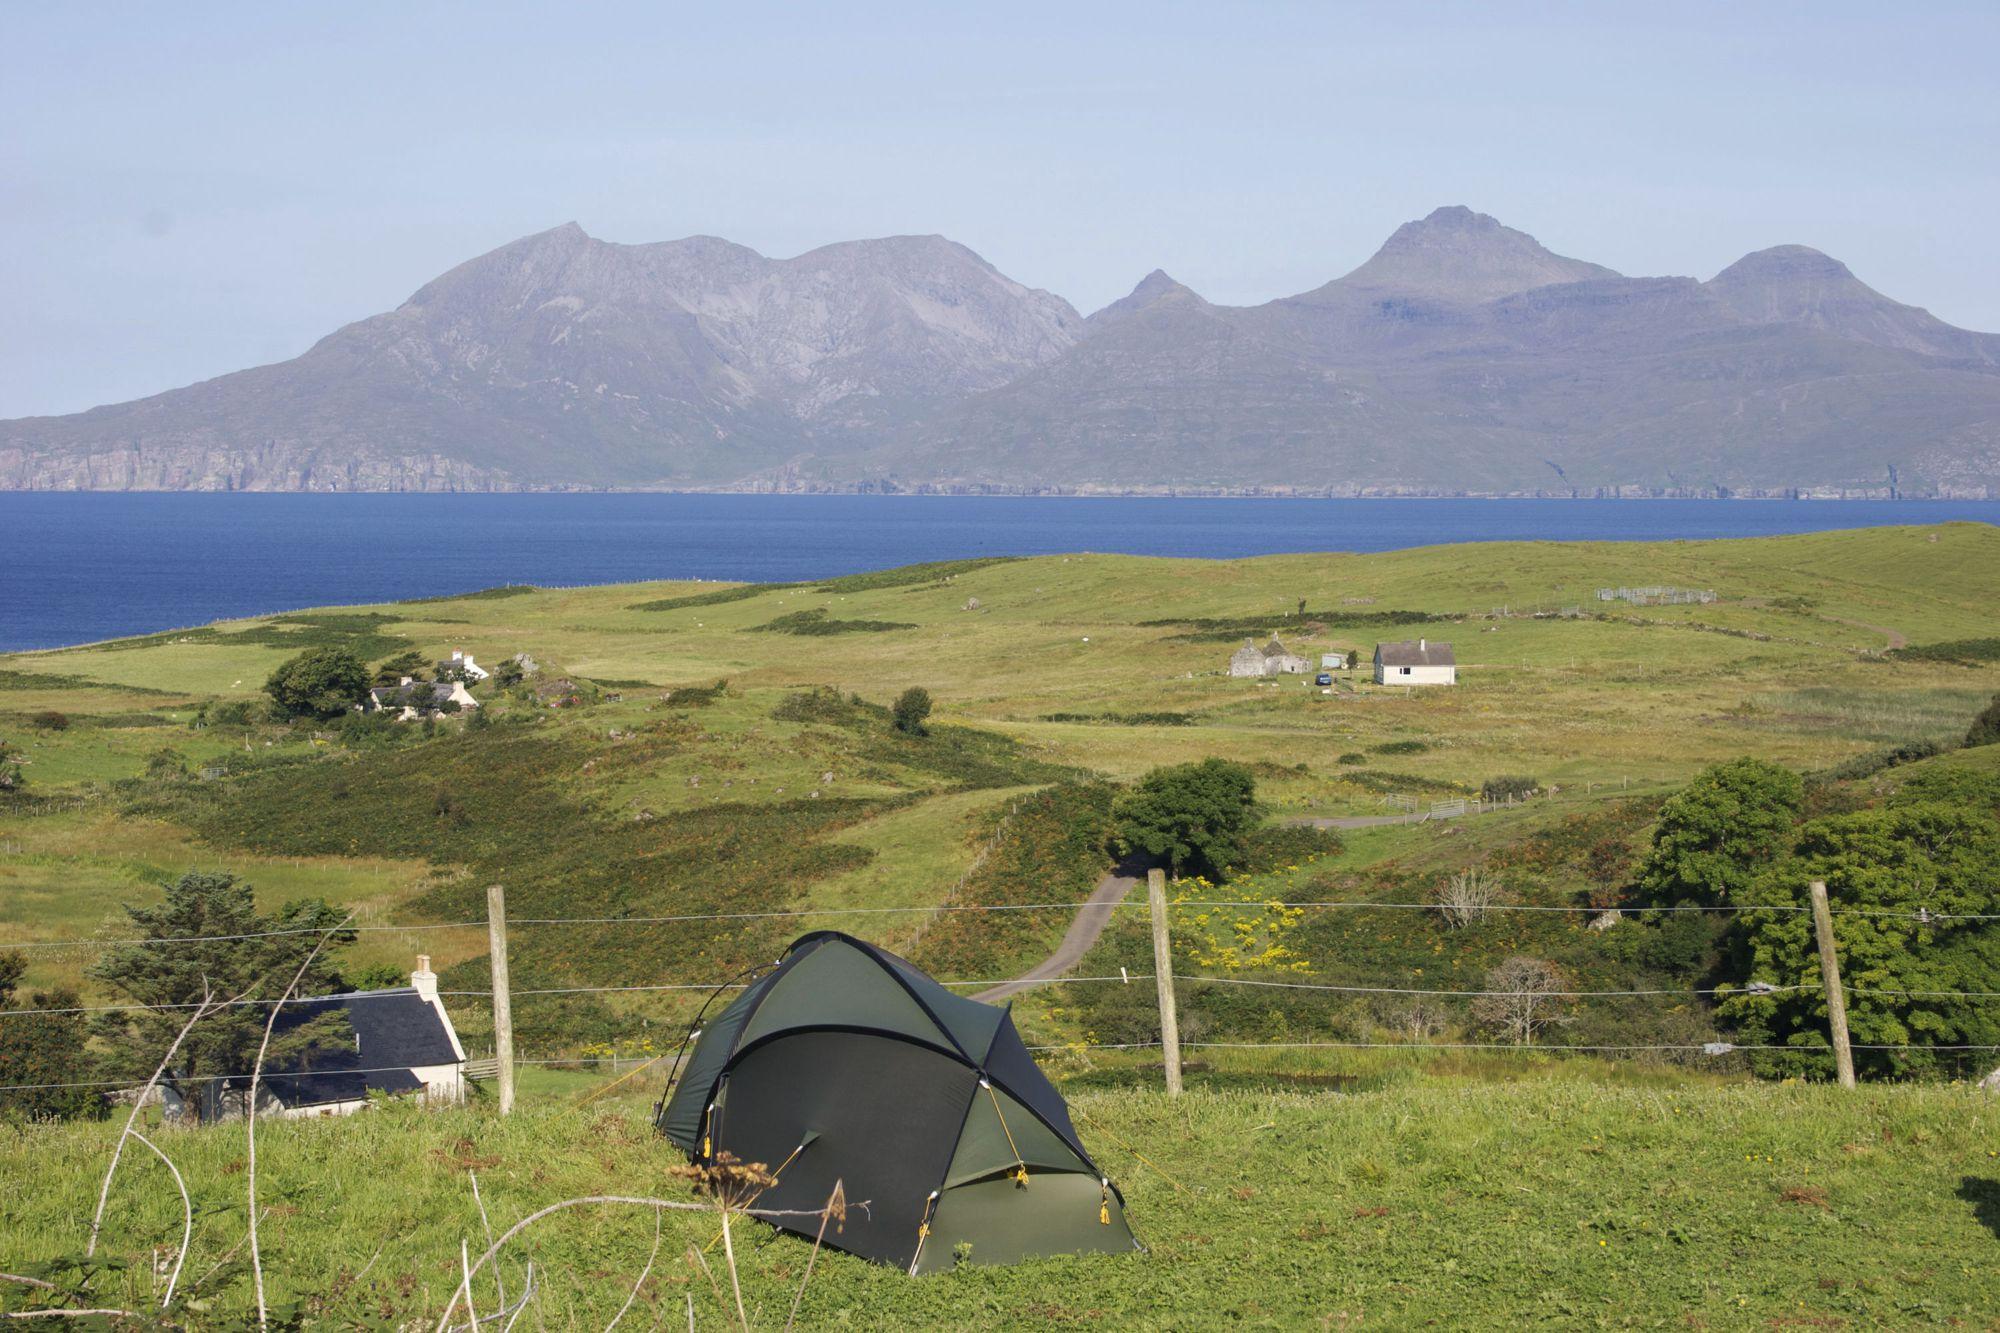 Campsites in Scotland – The top-rated campsites in Scotland